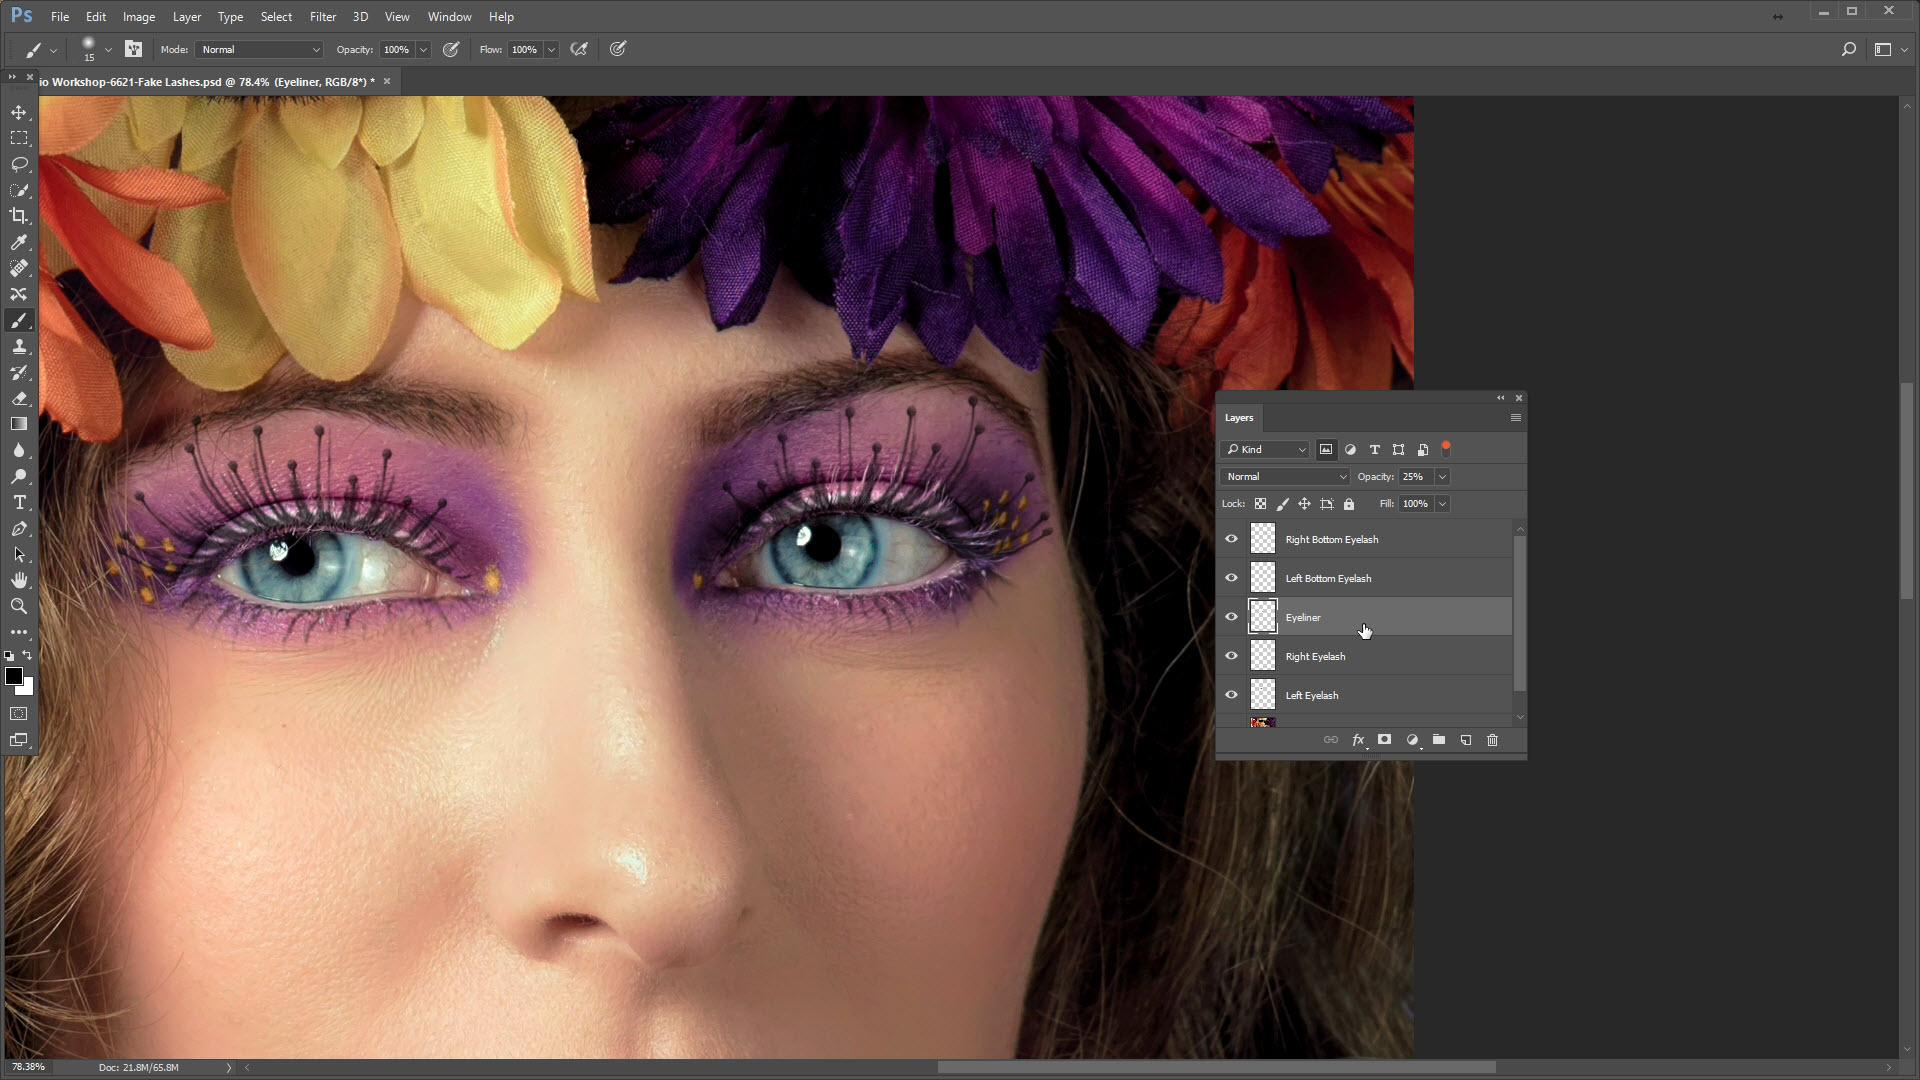 Featured-adding eye lashes